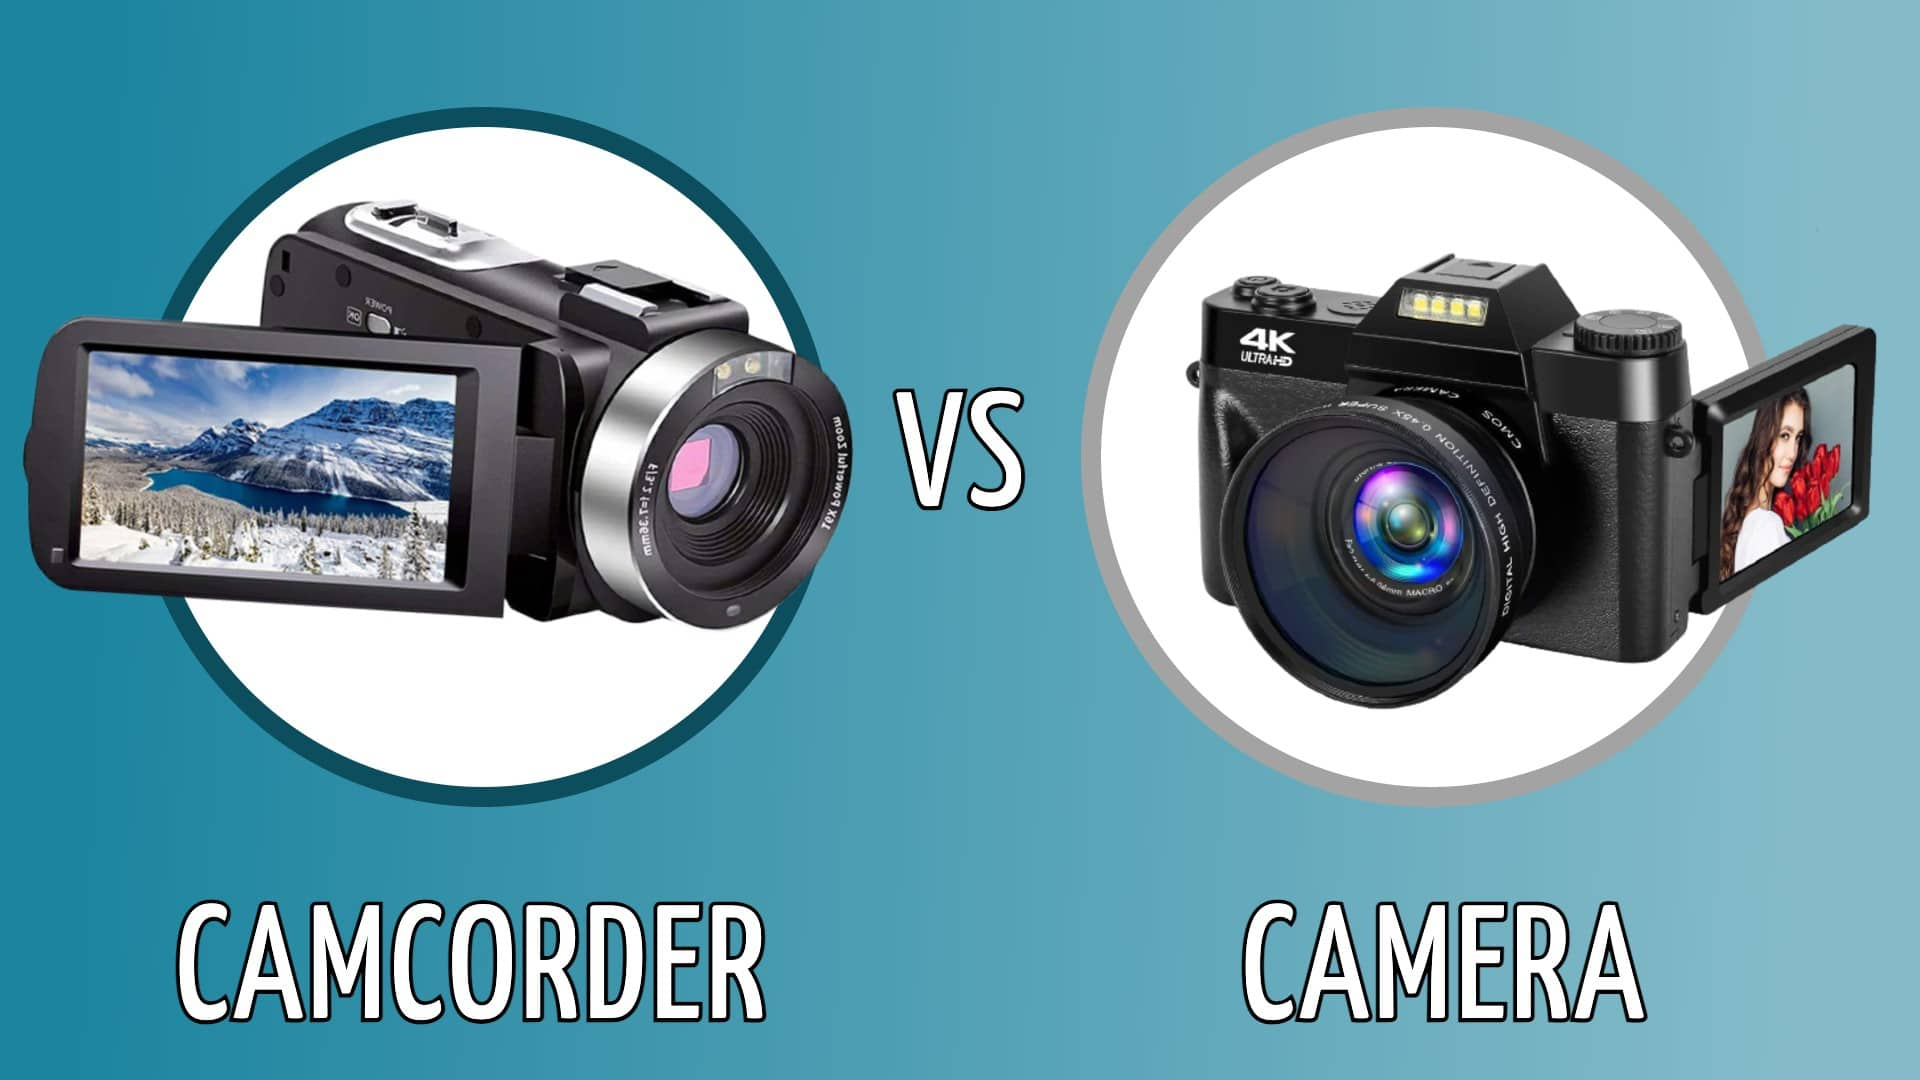 camcorder vs camera